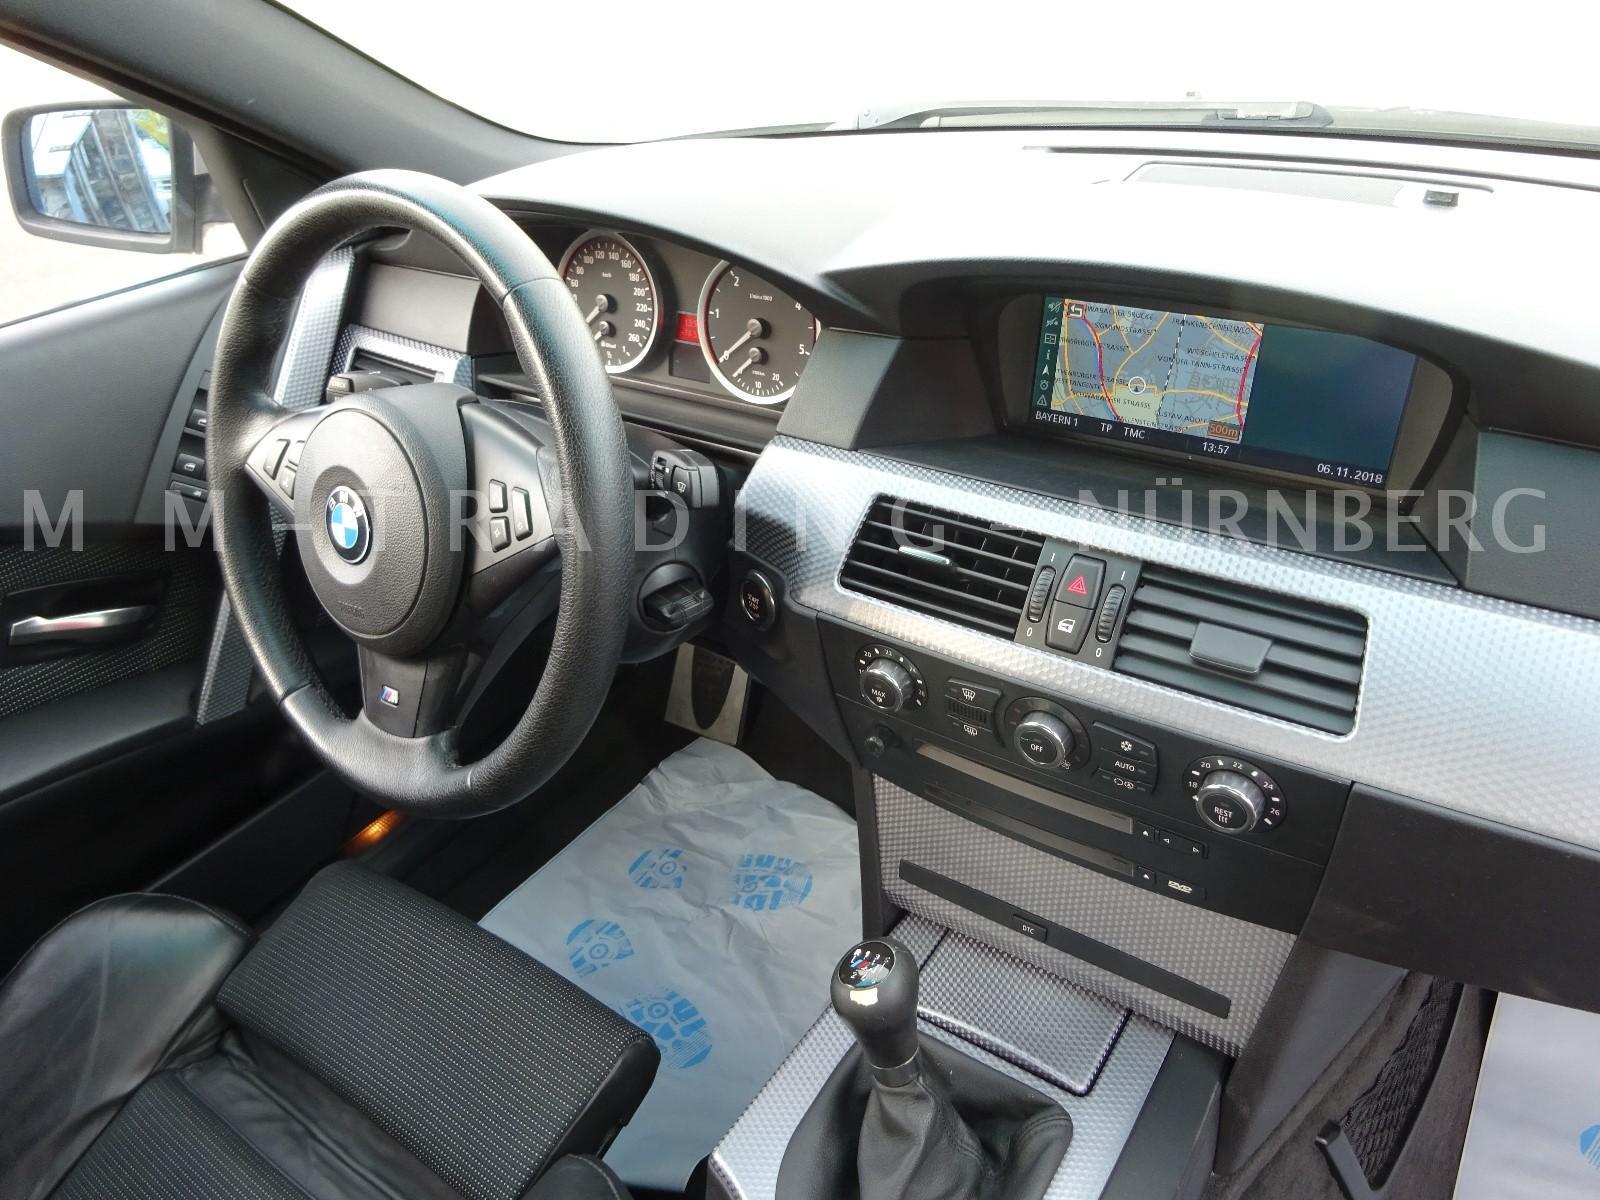 BMW E60 cu 566.000 km - BMW E60 cu 566.000 km